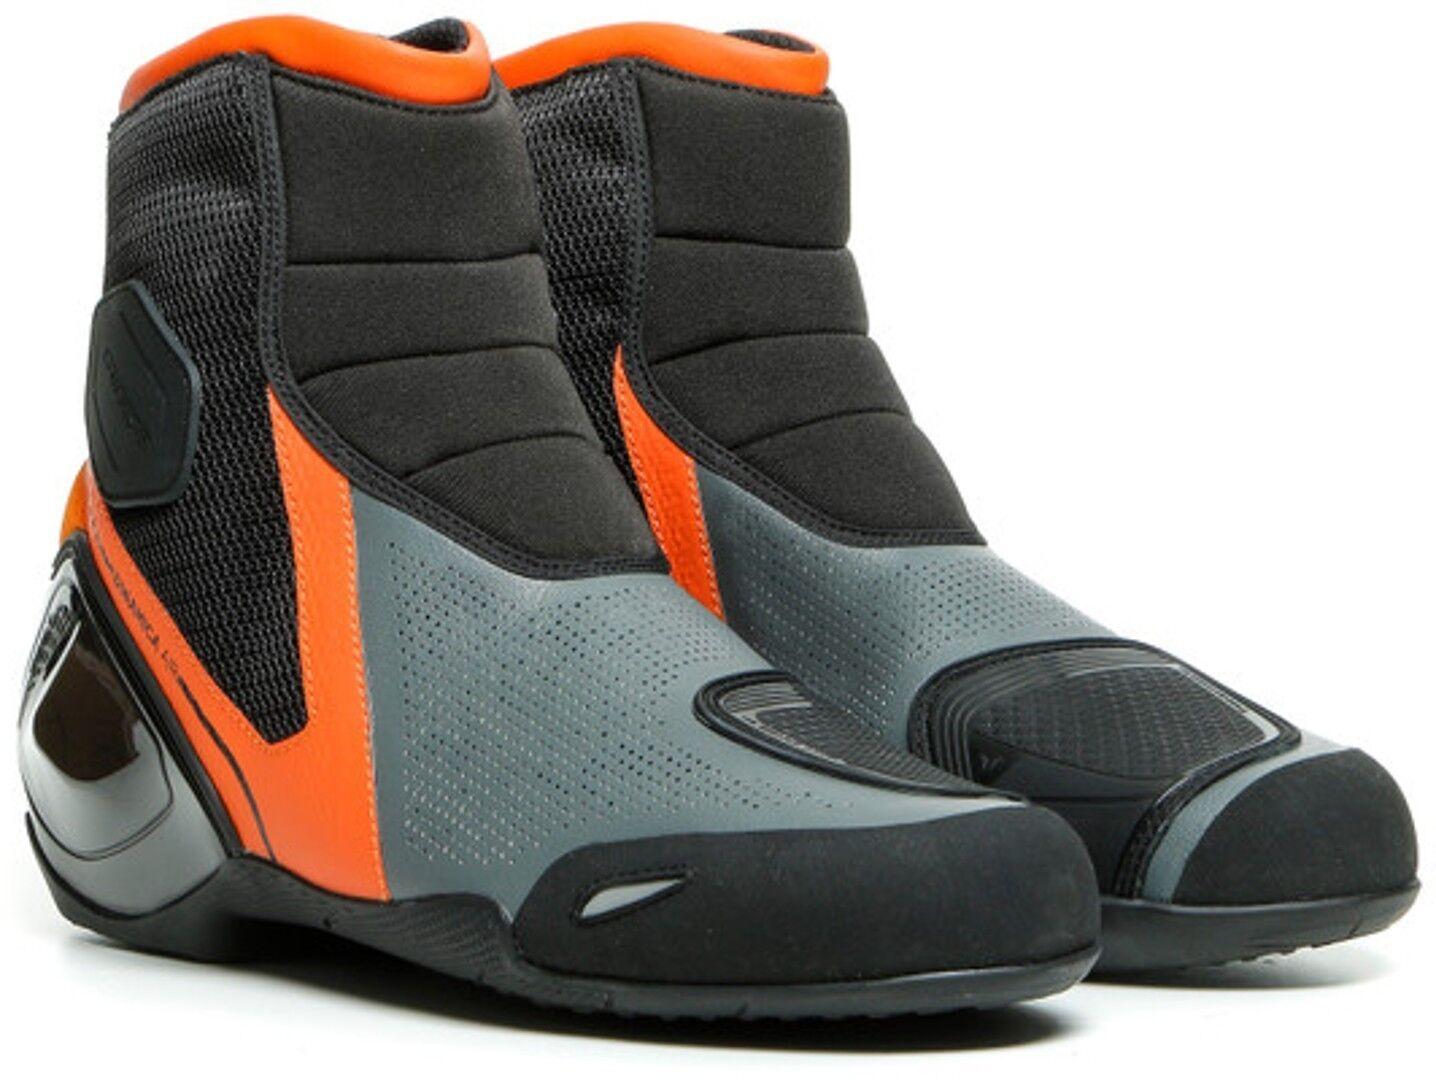 Dainese Dinamica Air Motorcycle Shoes Black Orange 40